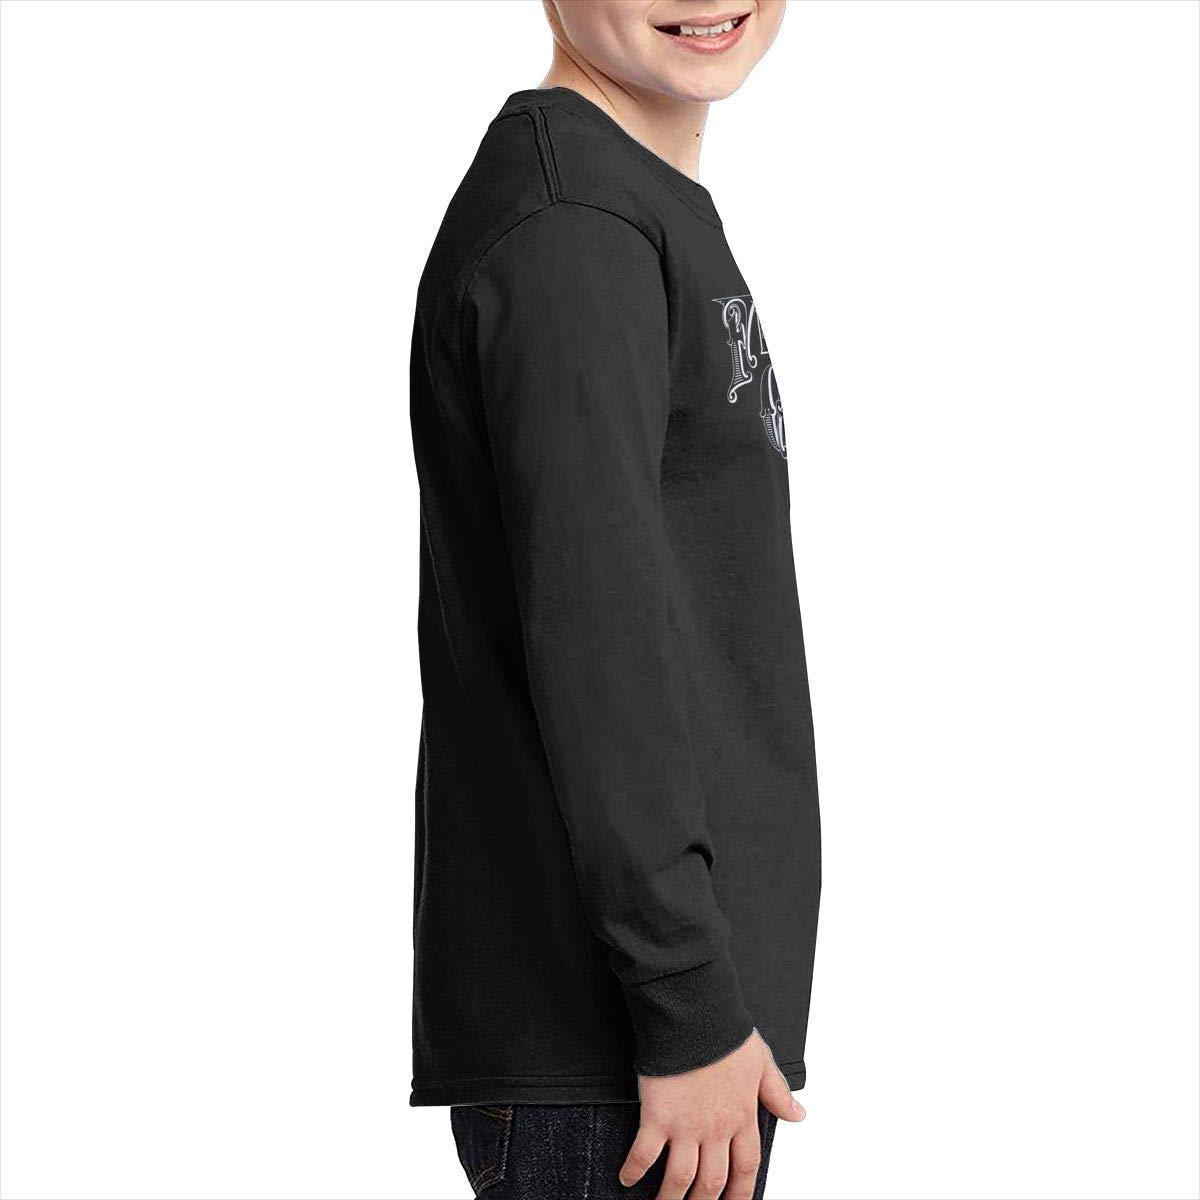 MichaelHazzard Florida Georgia Line Tour 2019 Youth Soft Long Sleeve Crewneck Tee T-Shirt for Boys and Girls